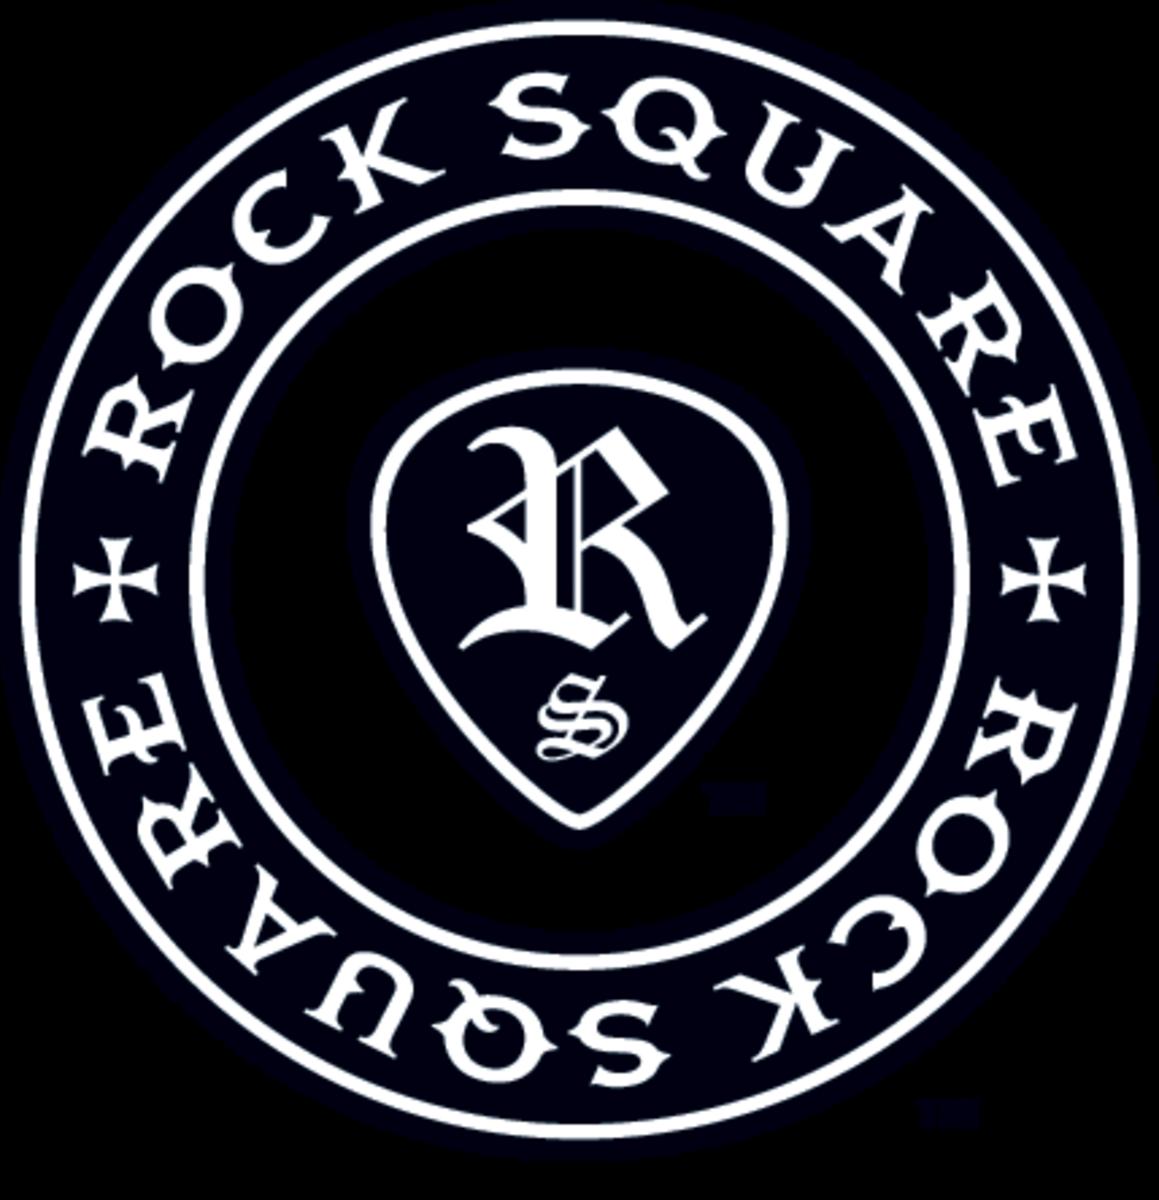 Rock Square logo